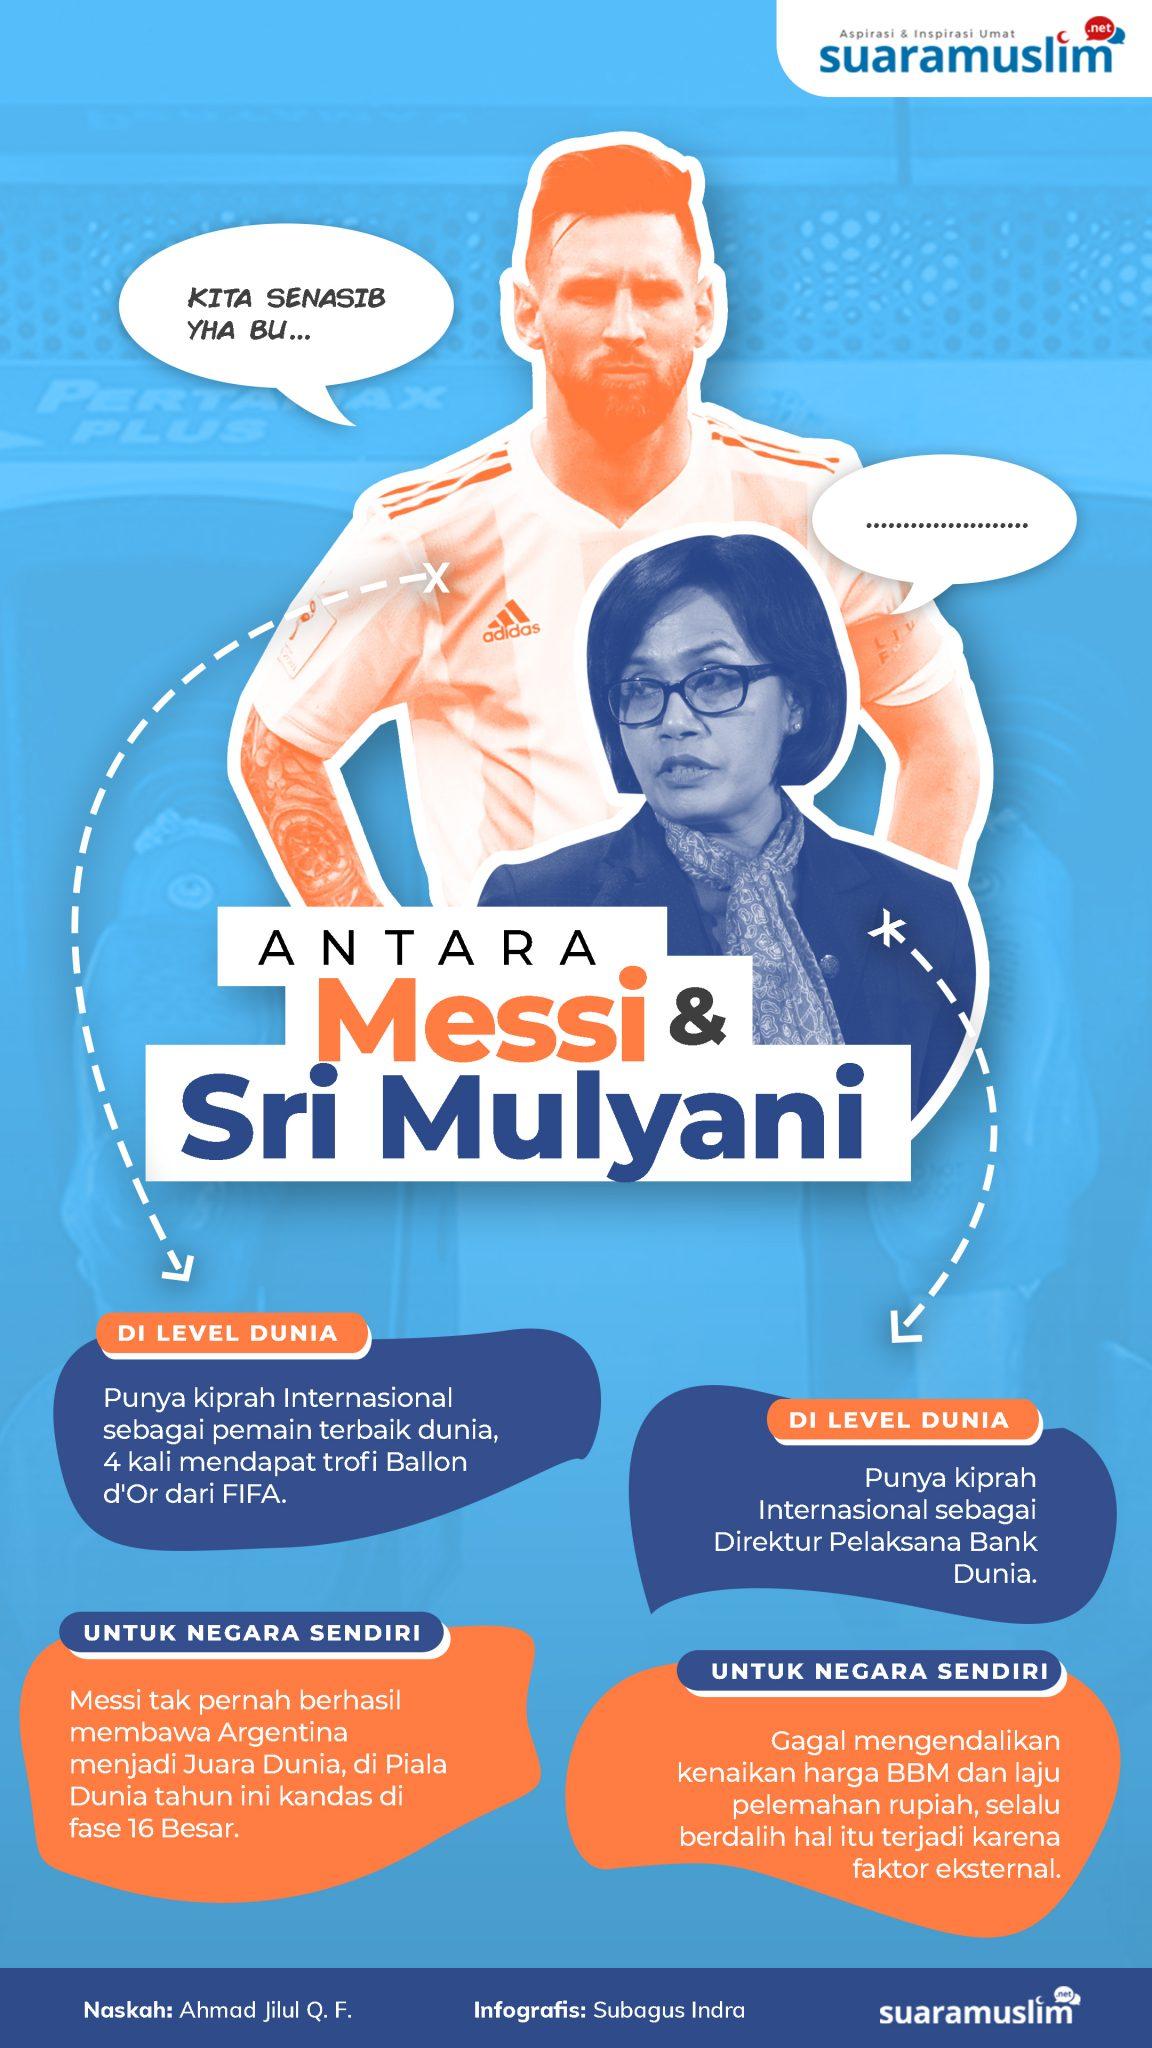 Antara Messi dan Sri Mulyani 2